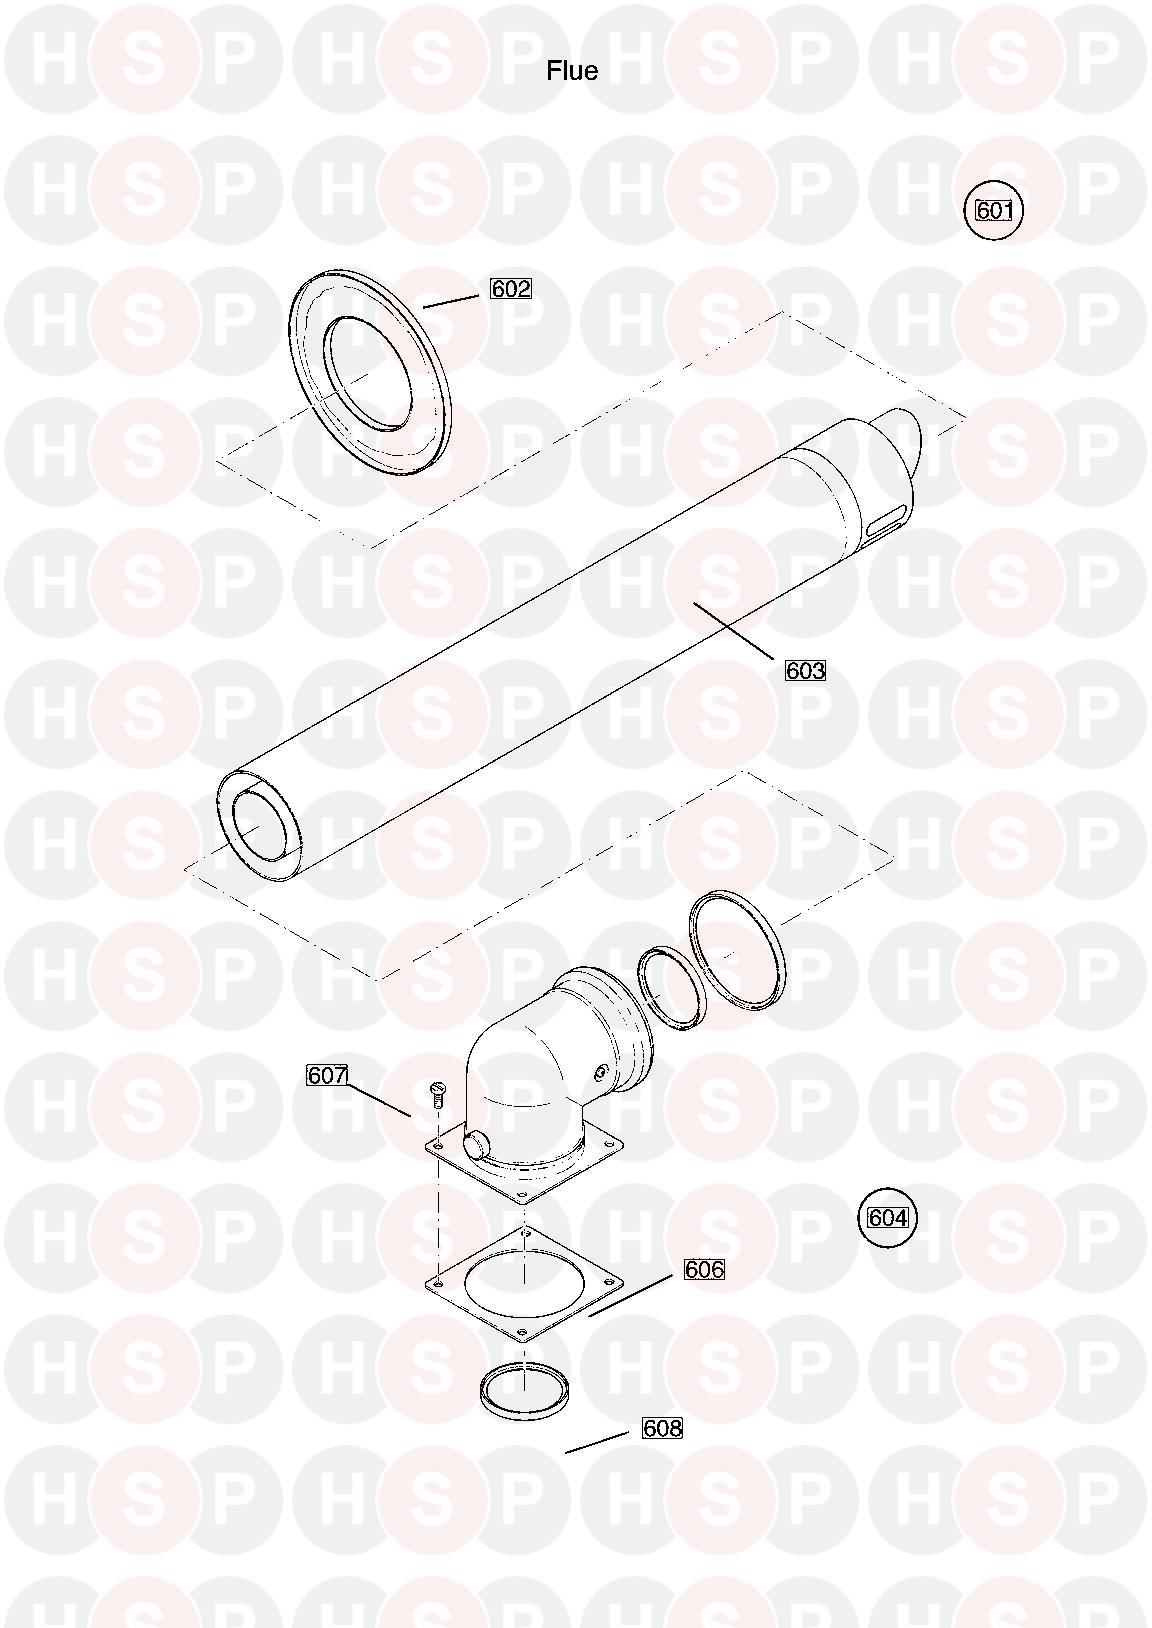 boiler controls wiring diagrams